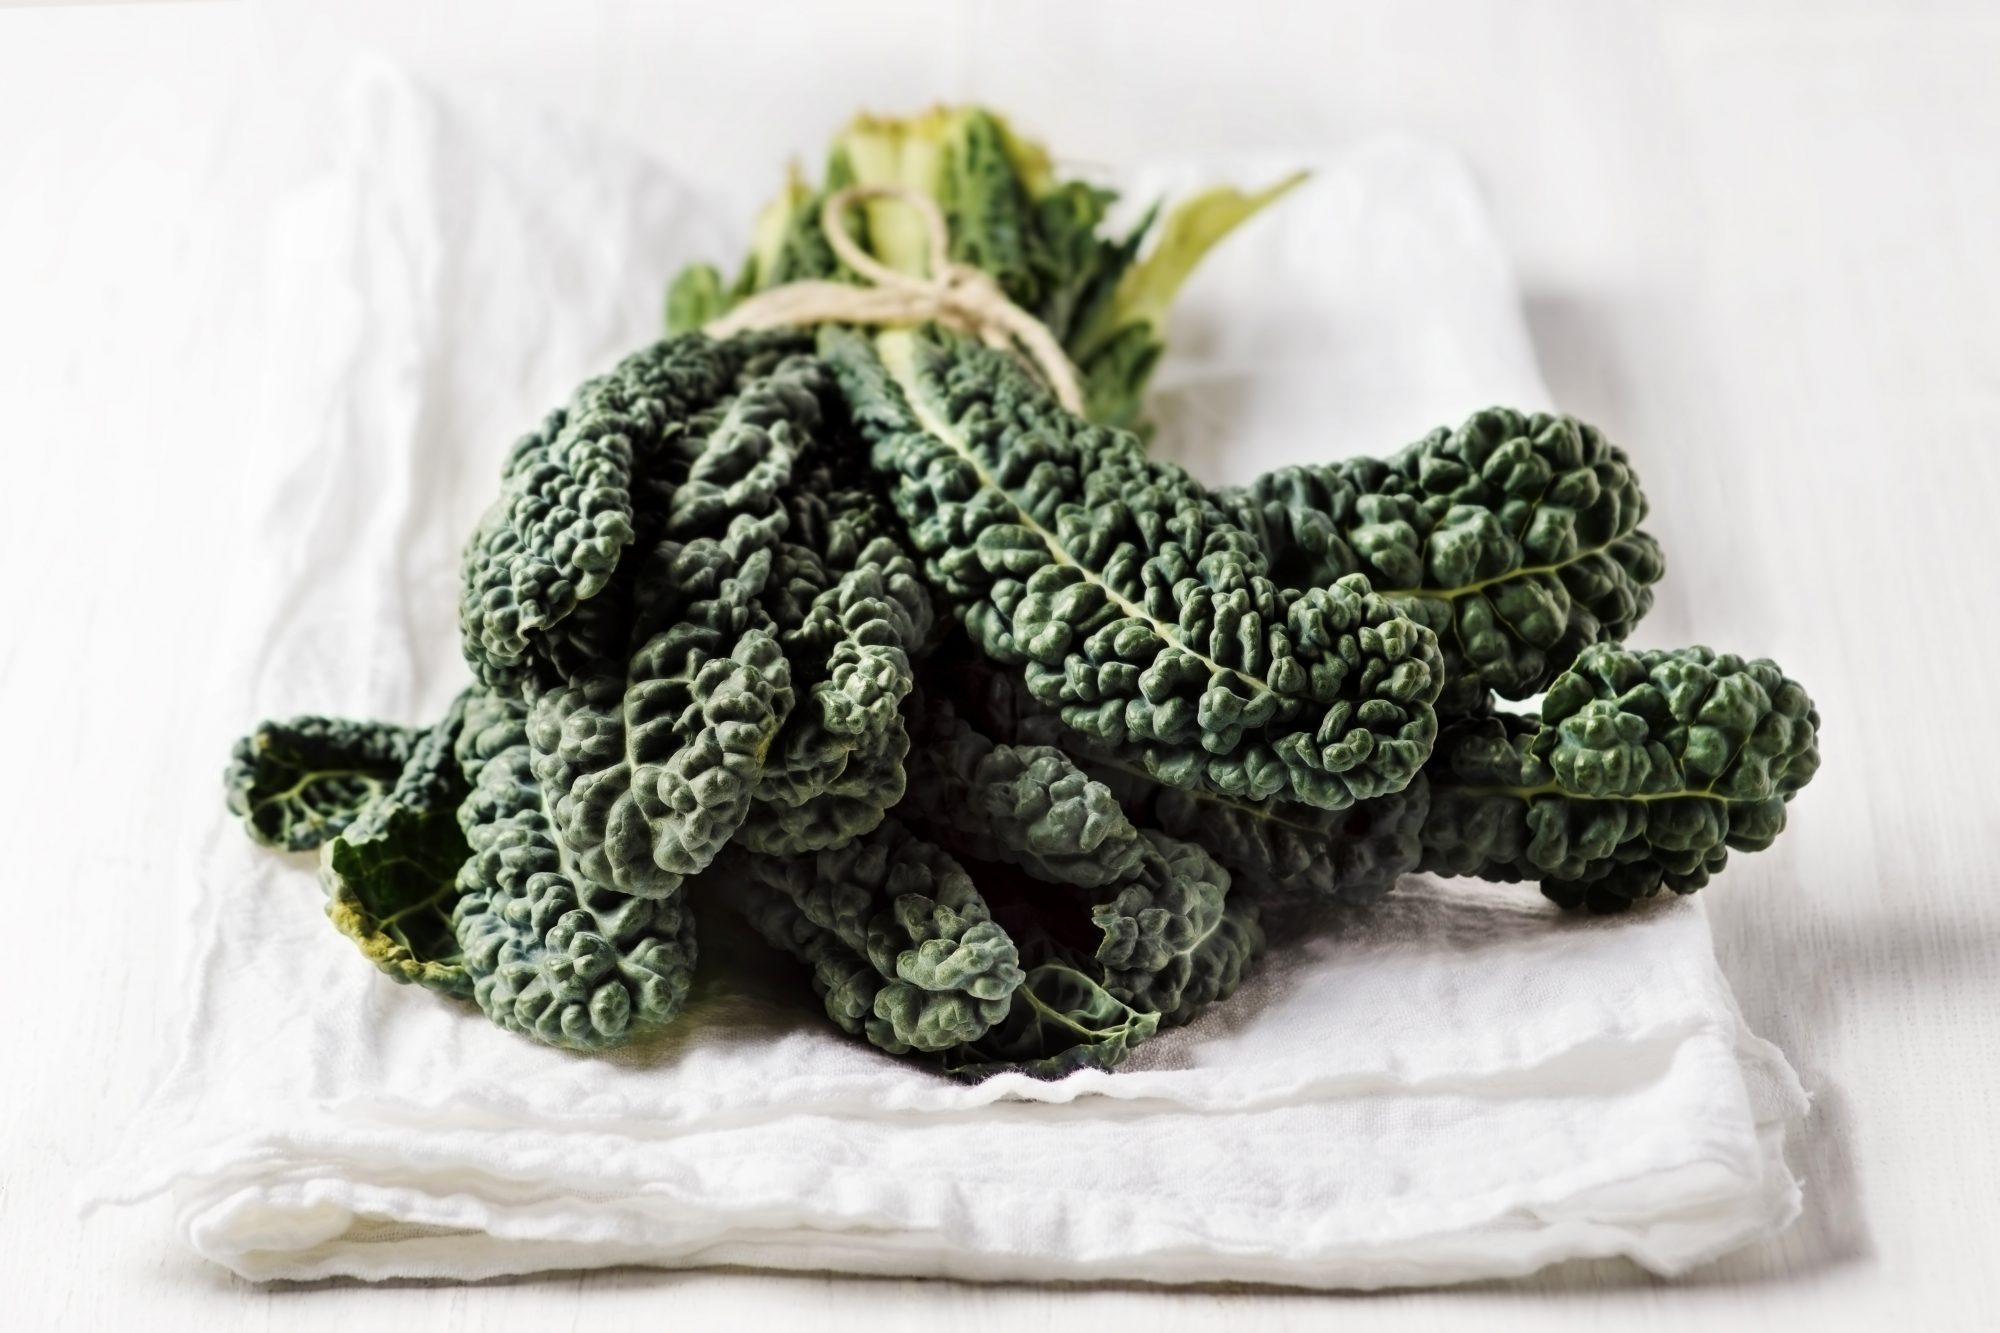 082120_Getty Kale image